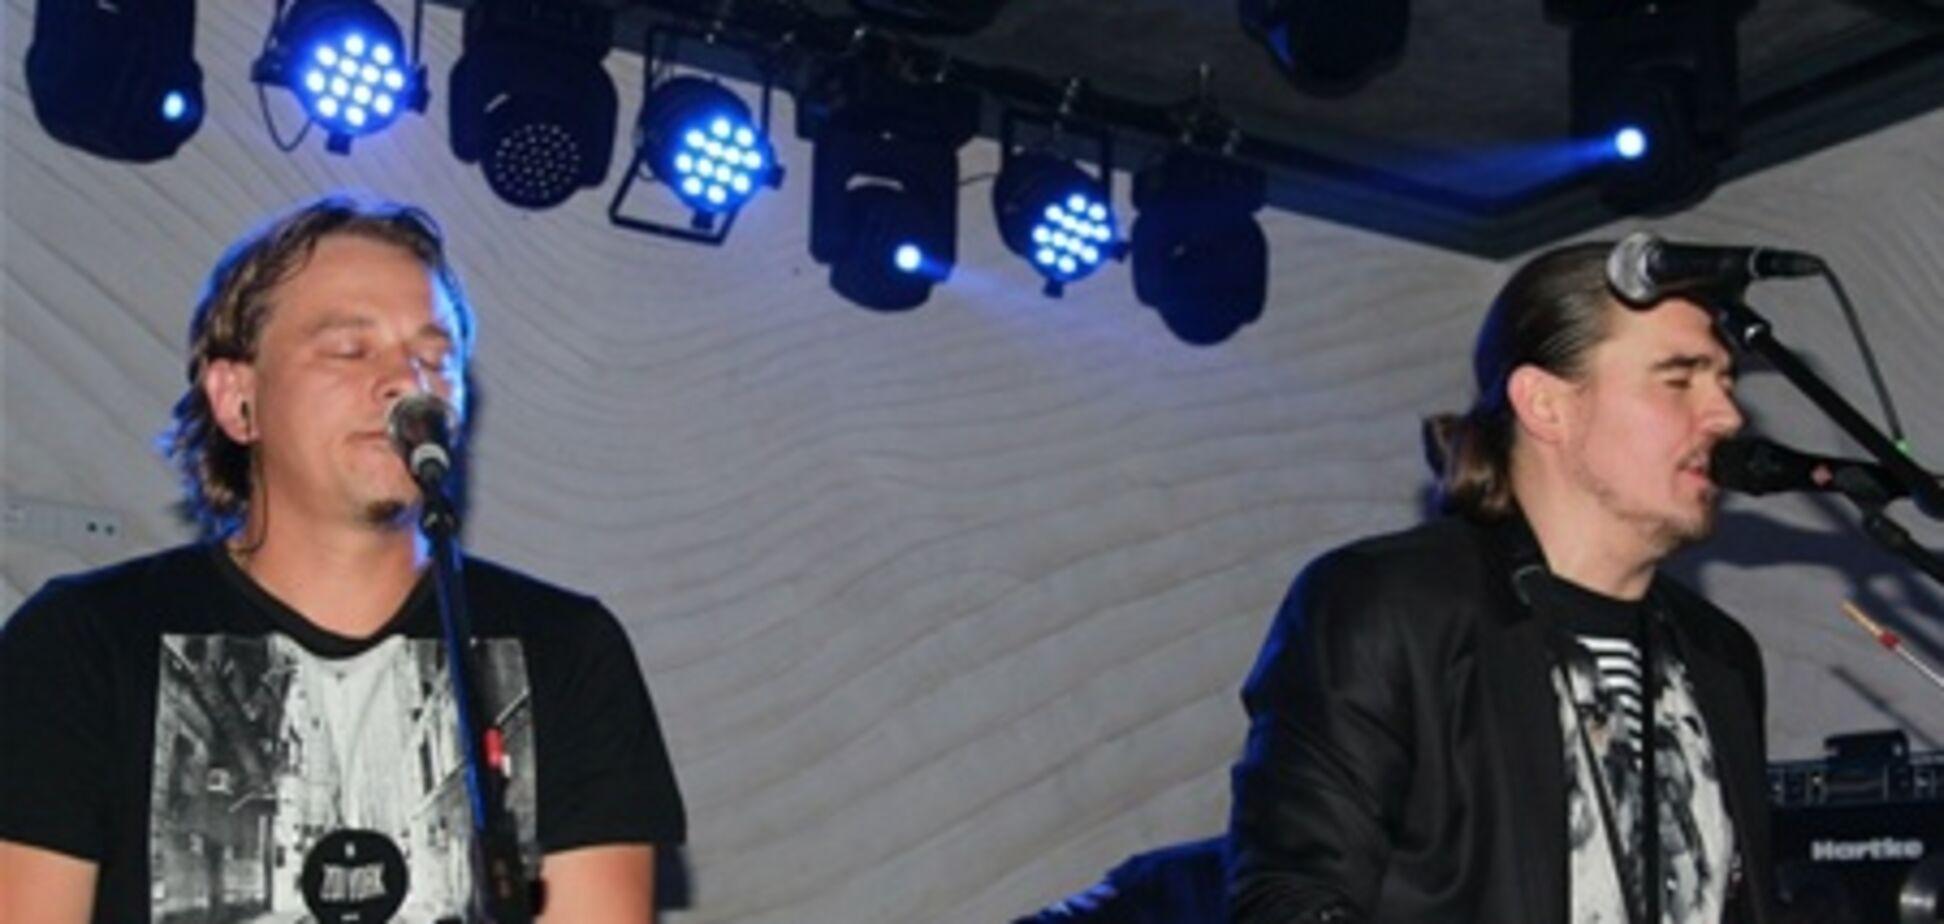 ТНМК исполнили 'Акустику' своим фанатам. Фото